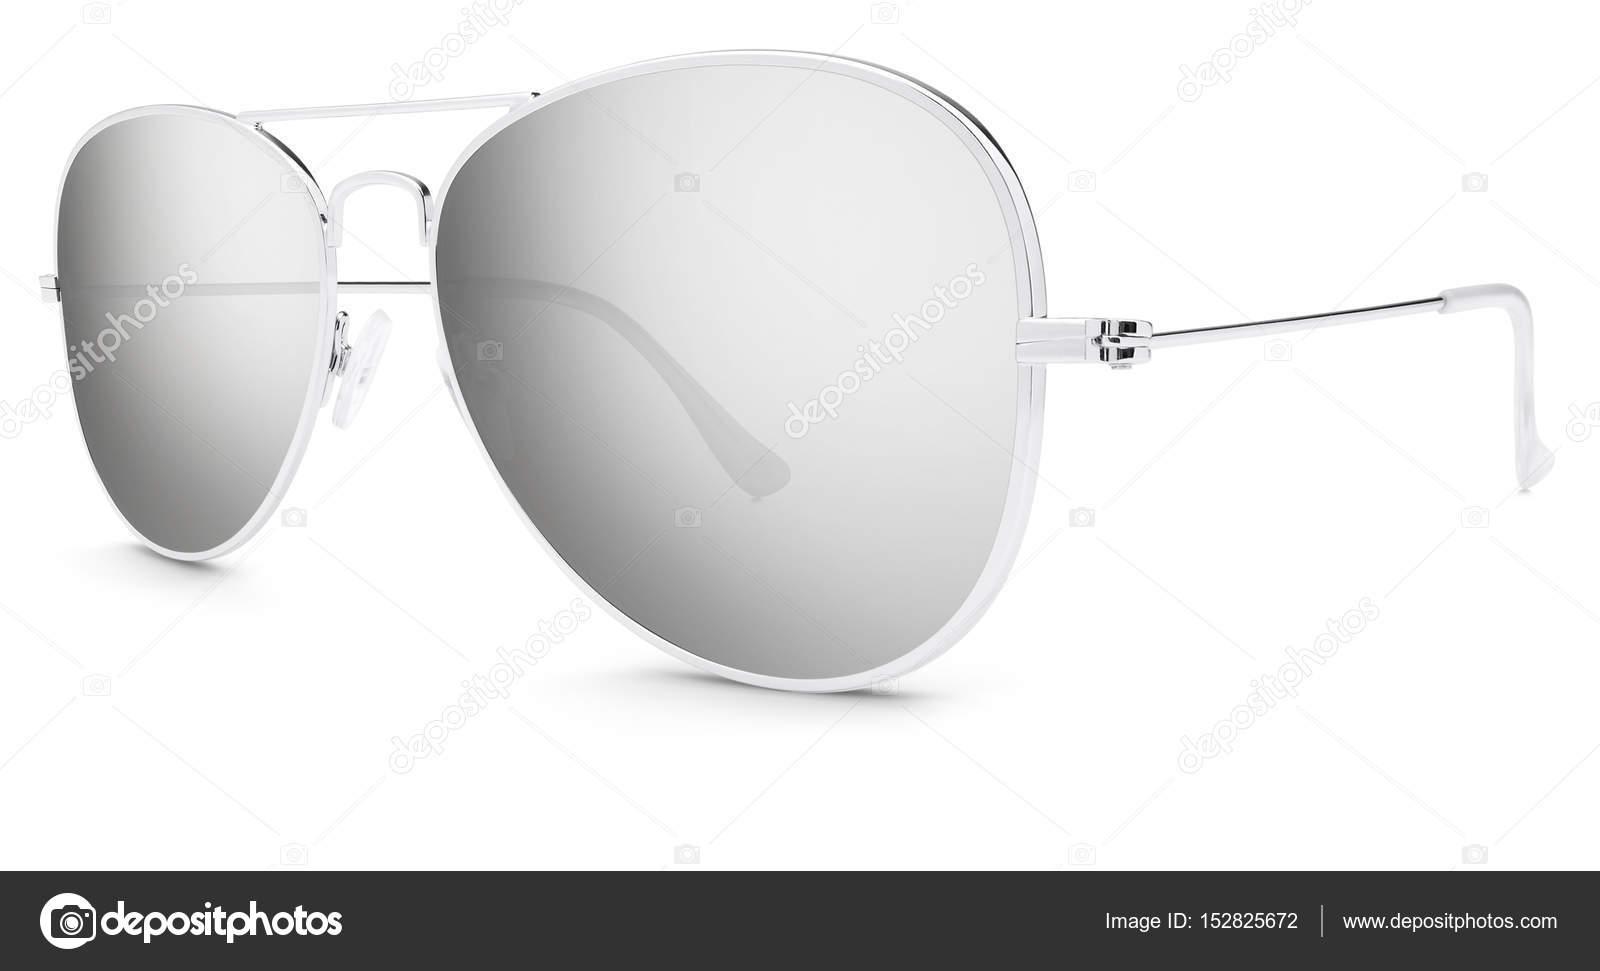 41e42b8475 Ασημένια γυαλιά ηλίου φακούς γκρι καθρέφτη που απομονώνονται σε λευκό φόντο  — Εικόνα από ...